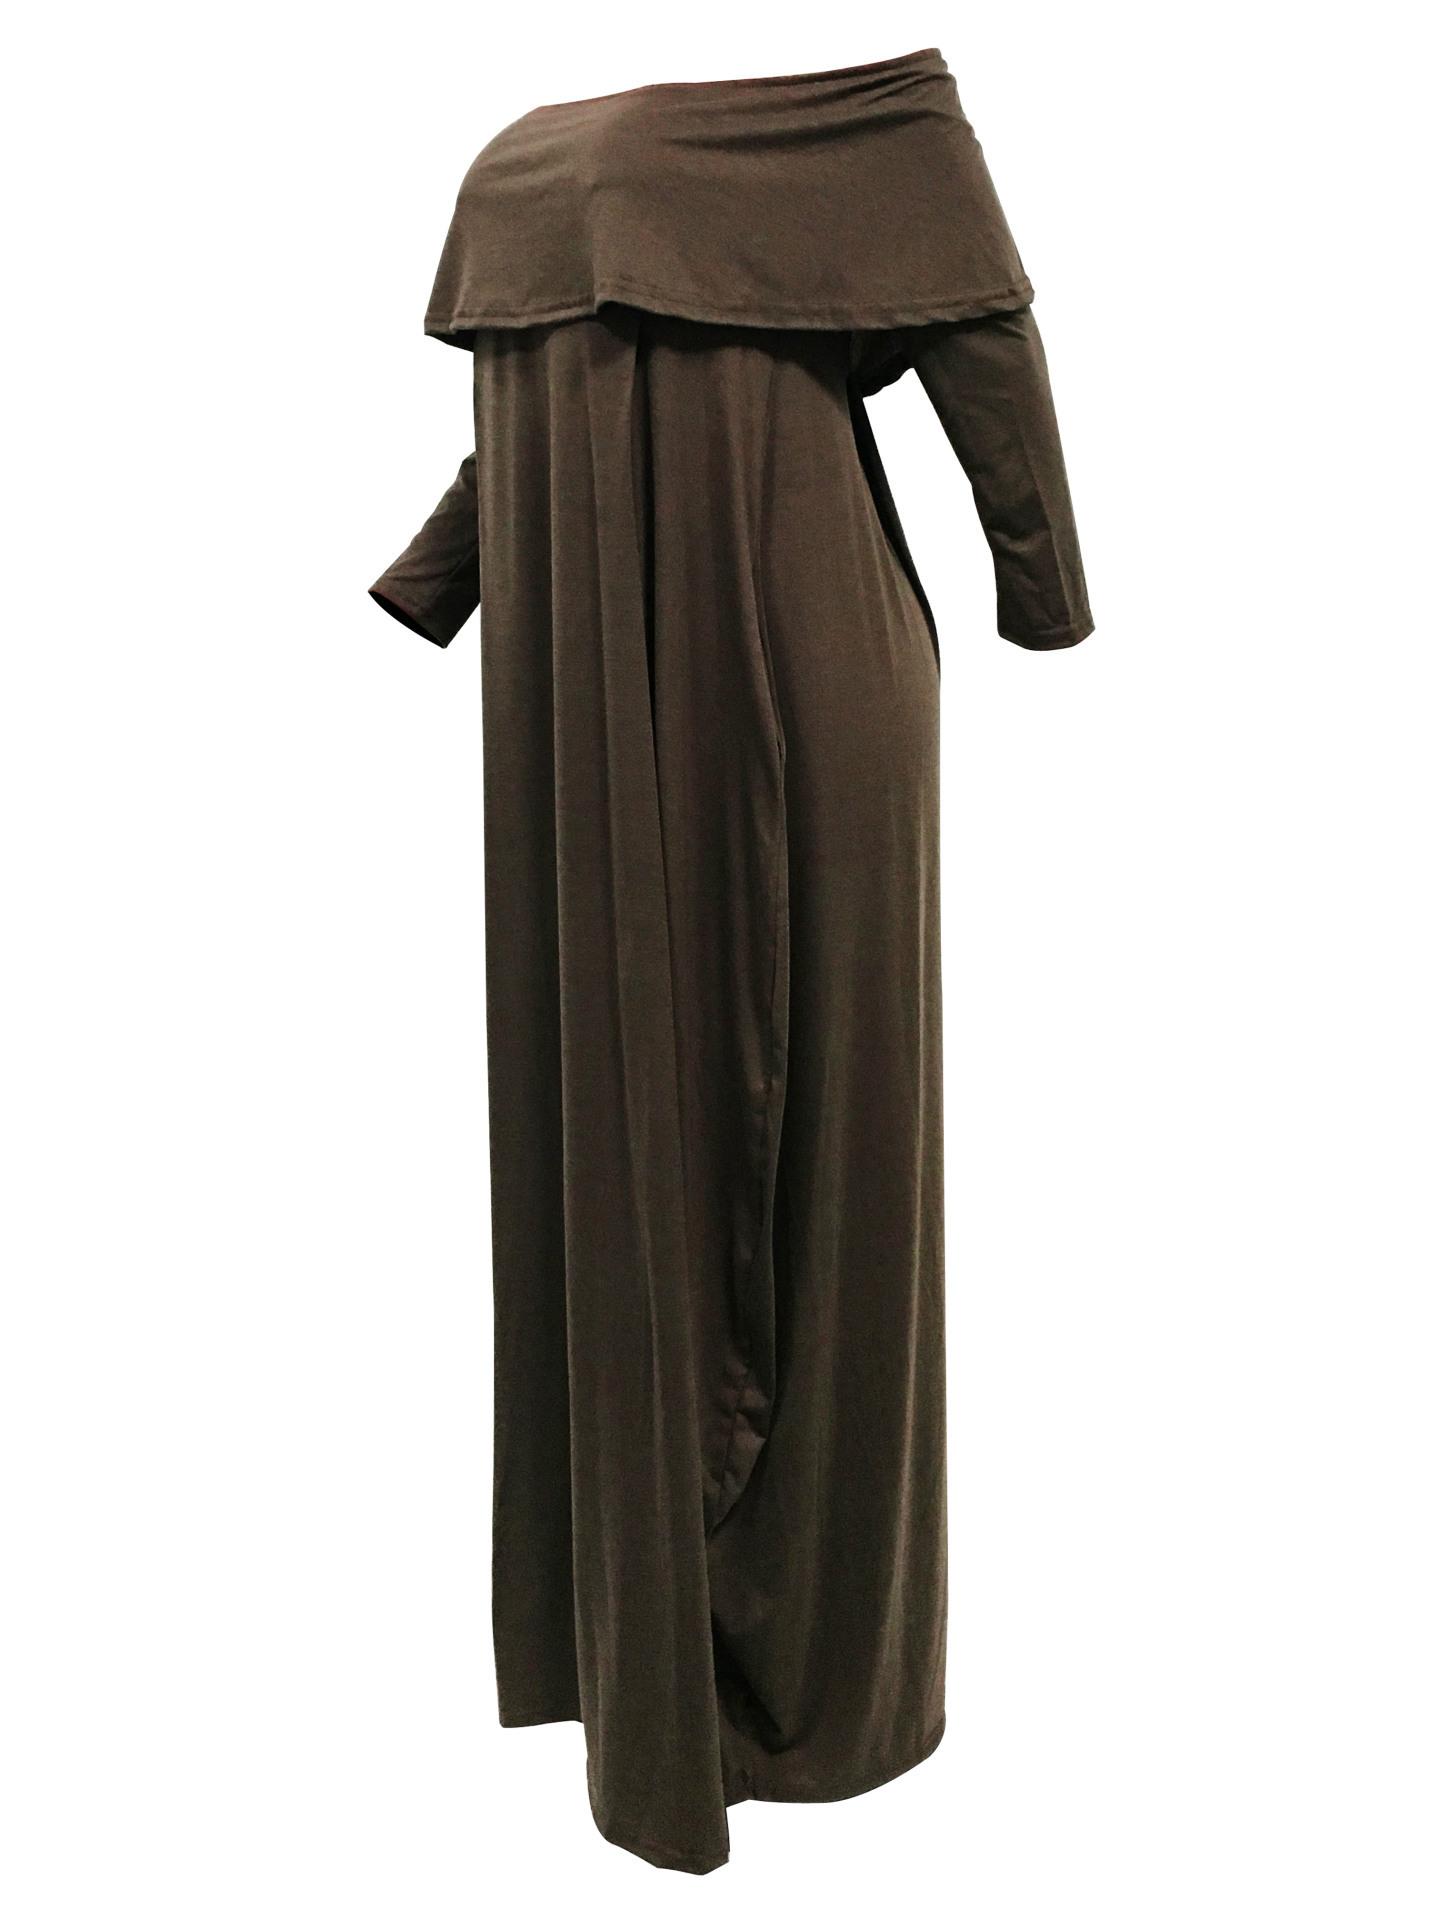 Mode Tau Schulter Falbala Design Grau-grün Baumwollmischung Knöchellängenkleid